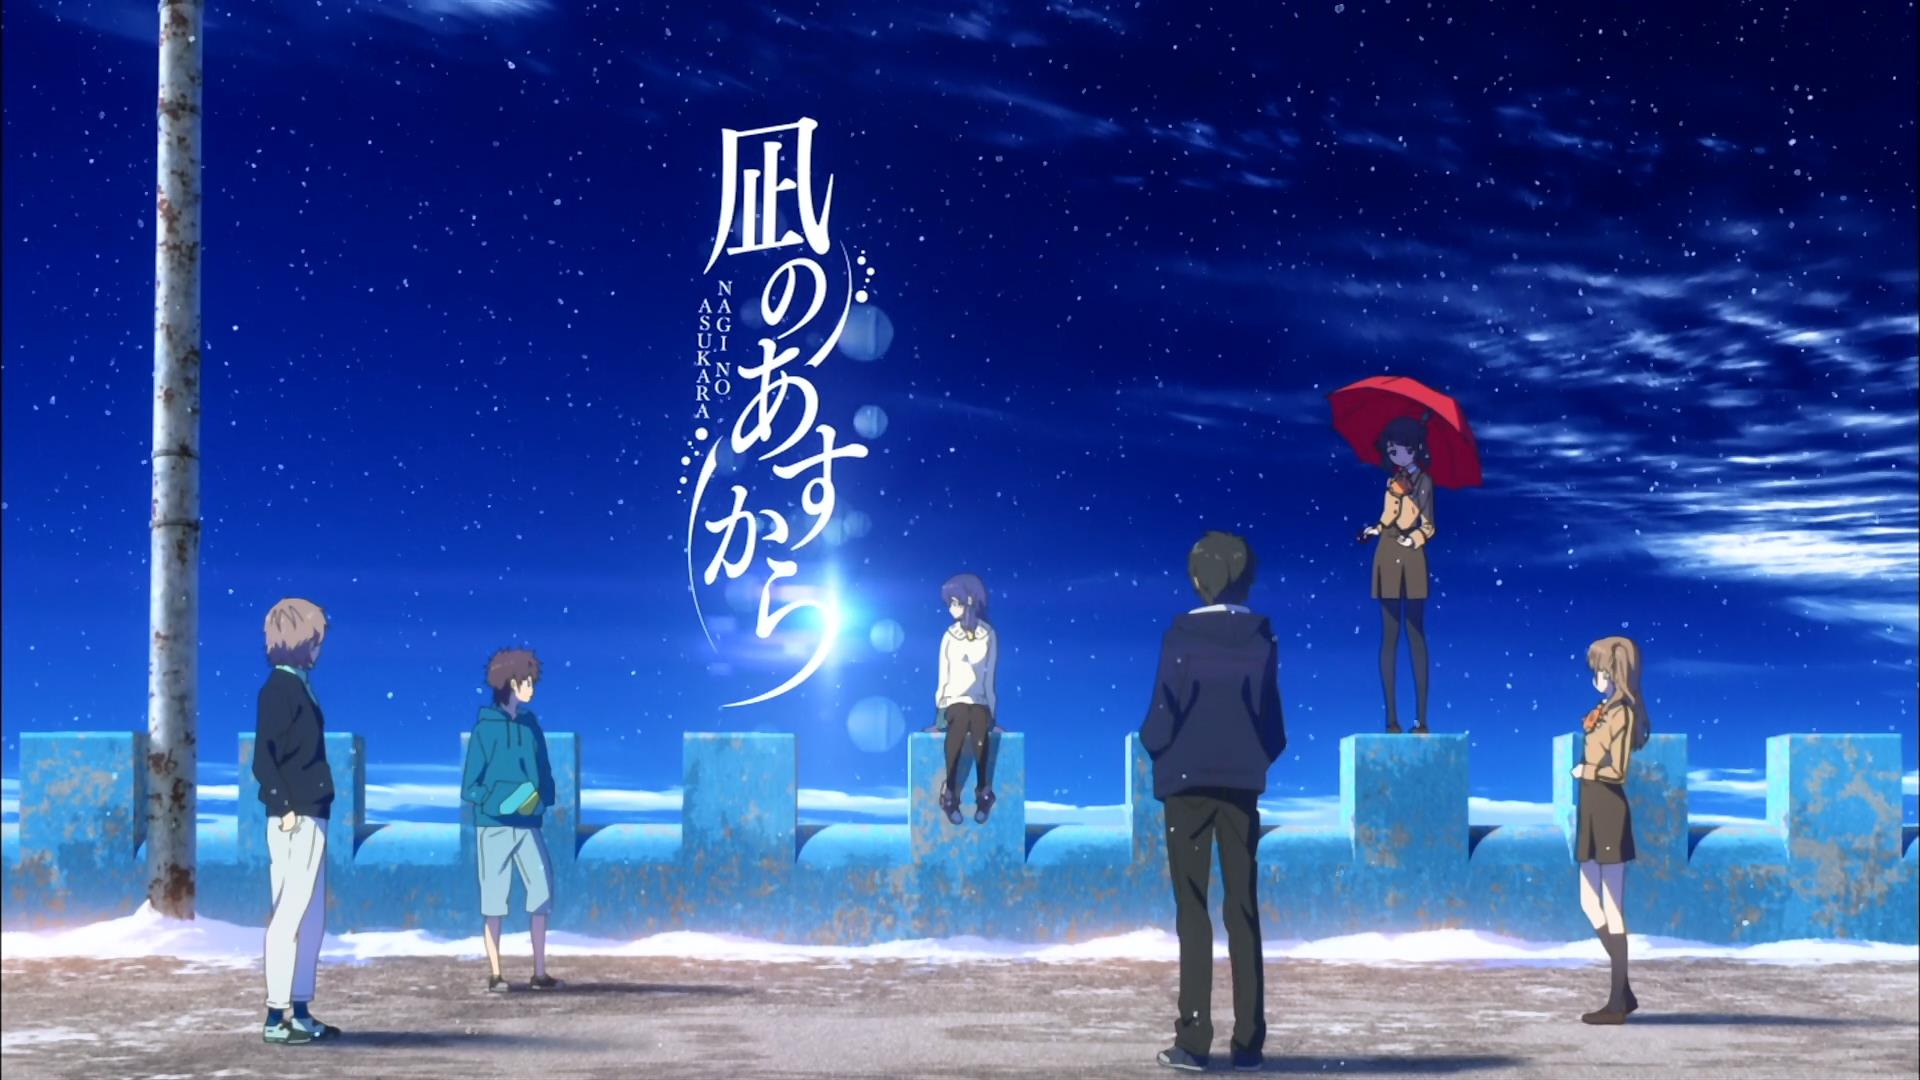 Inilah Rekomendasi Anime sambil menunggu Waktu Berbuka Puasa Part 2